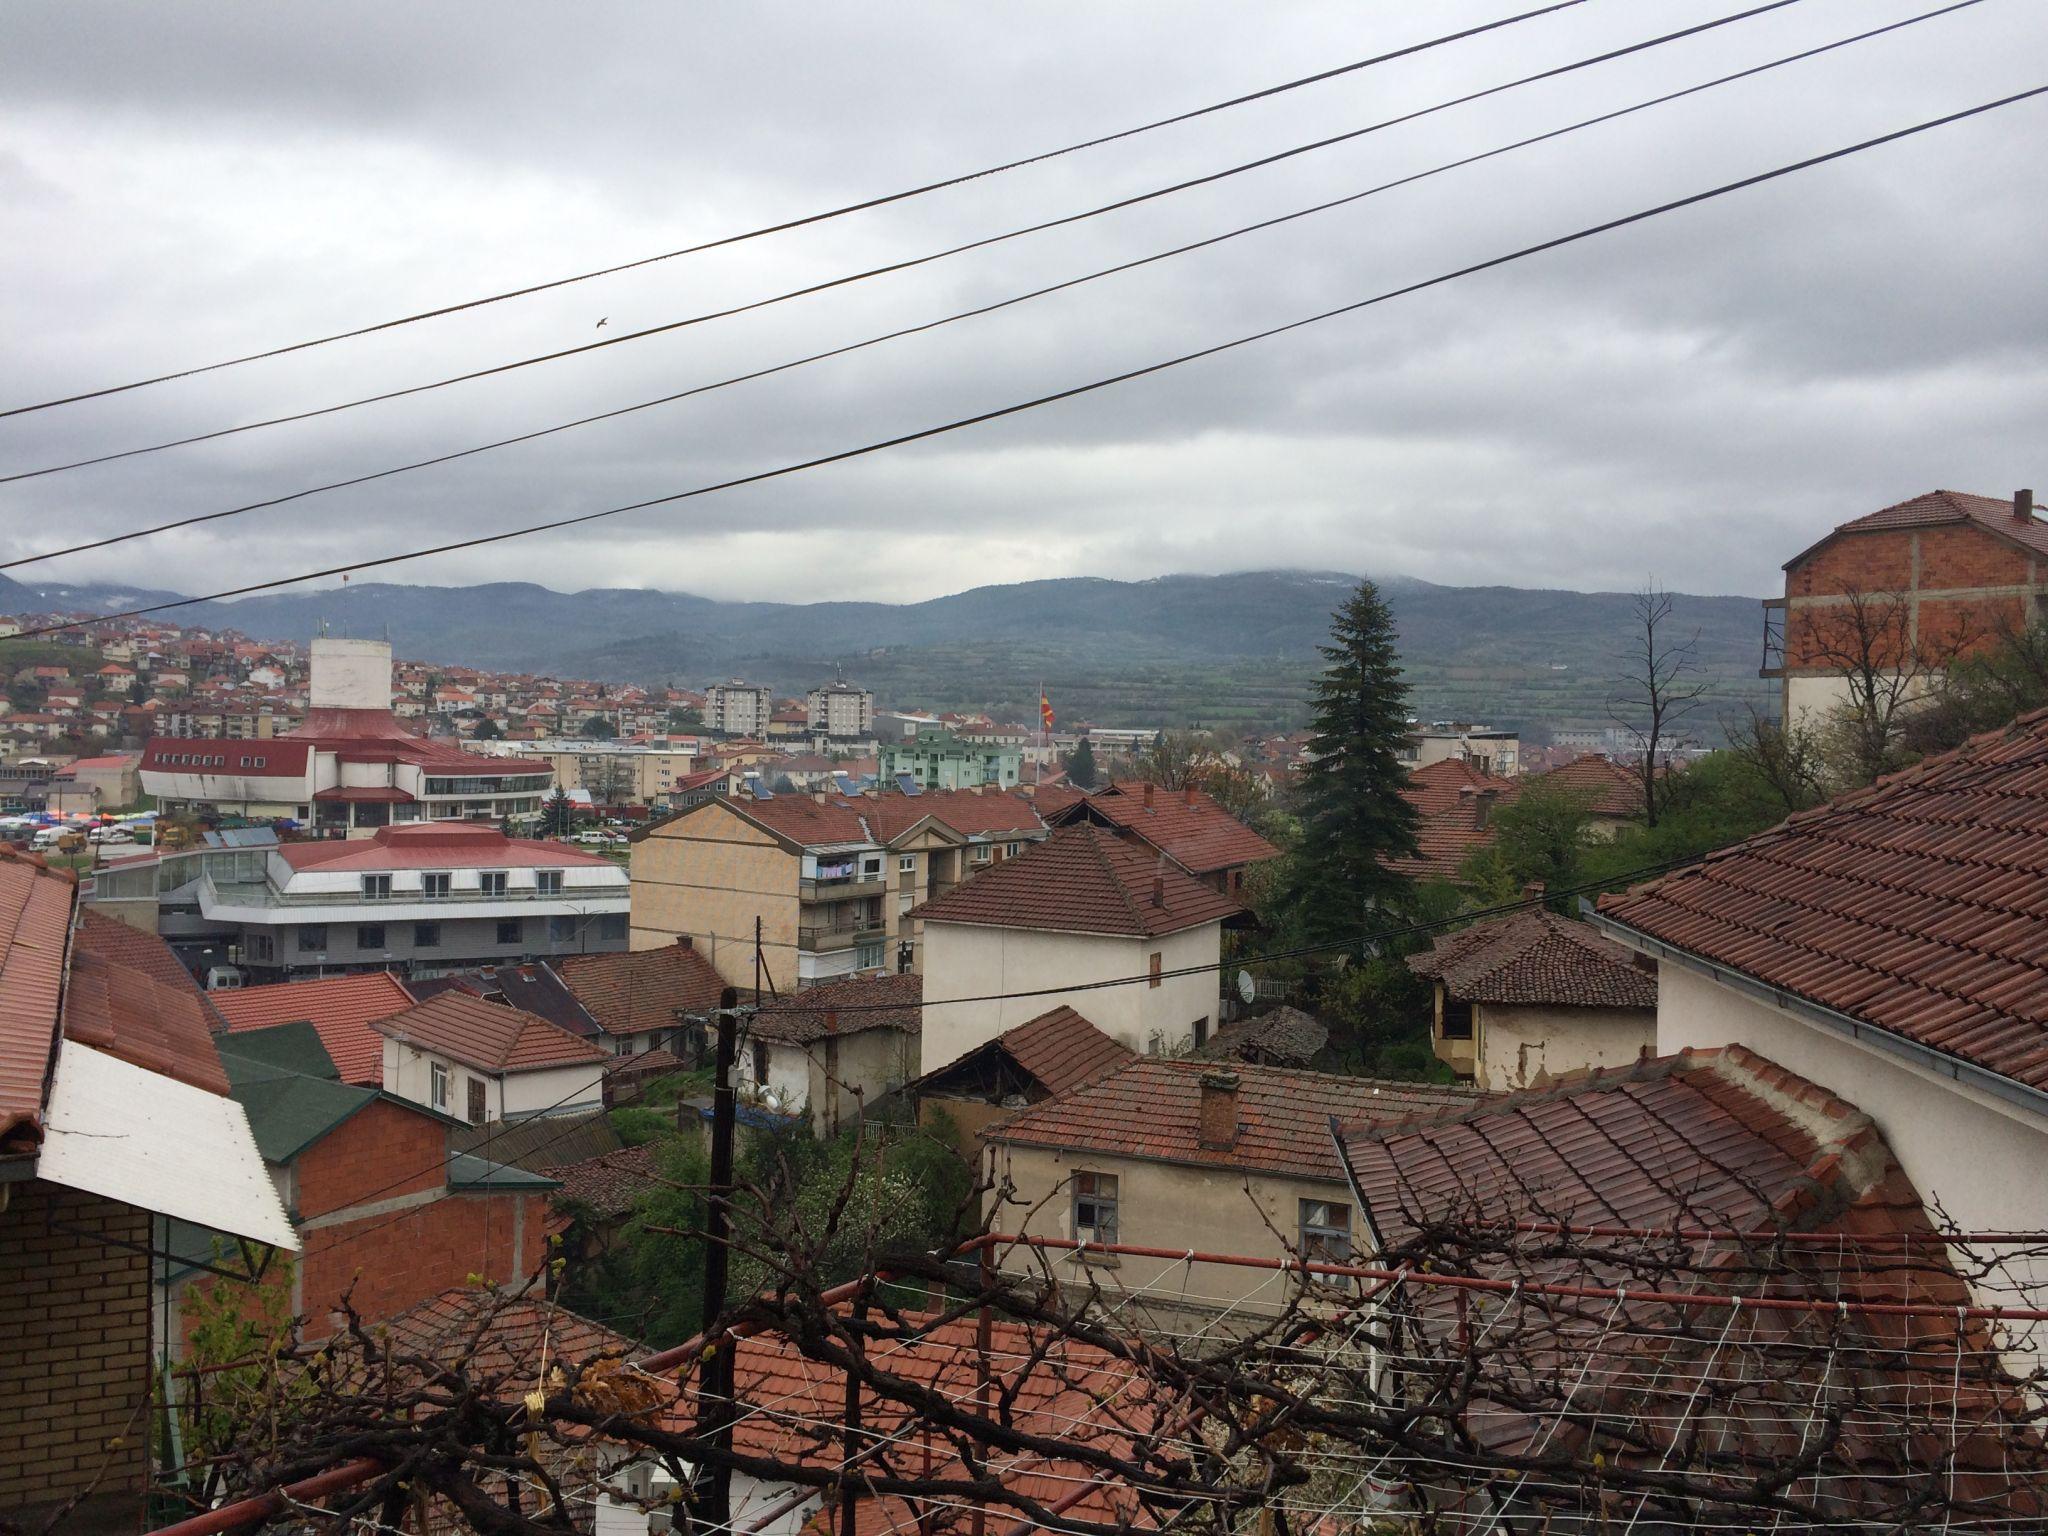 IMG 0343 - Macedonian landscapes